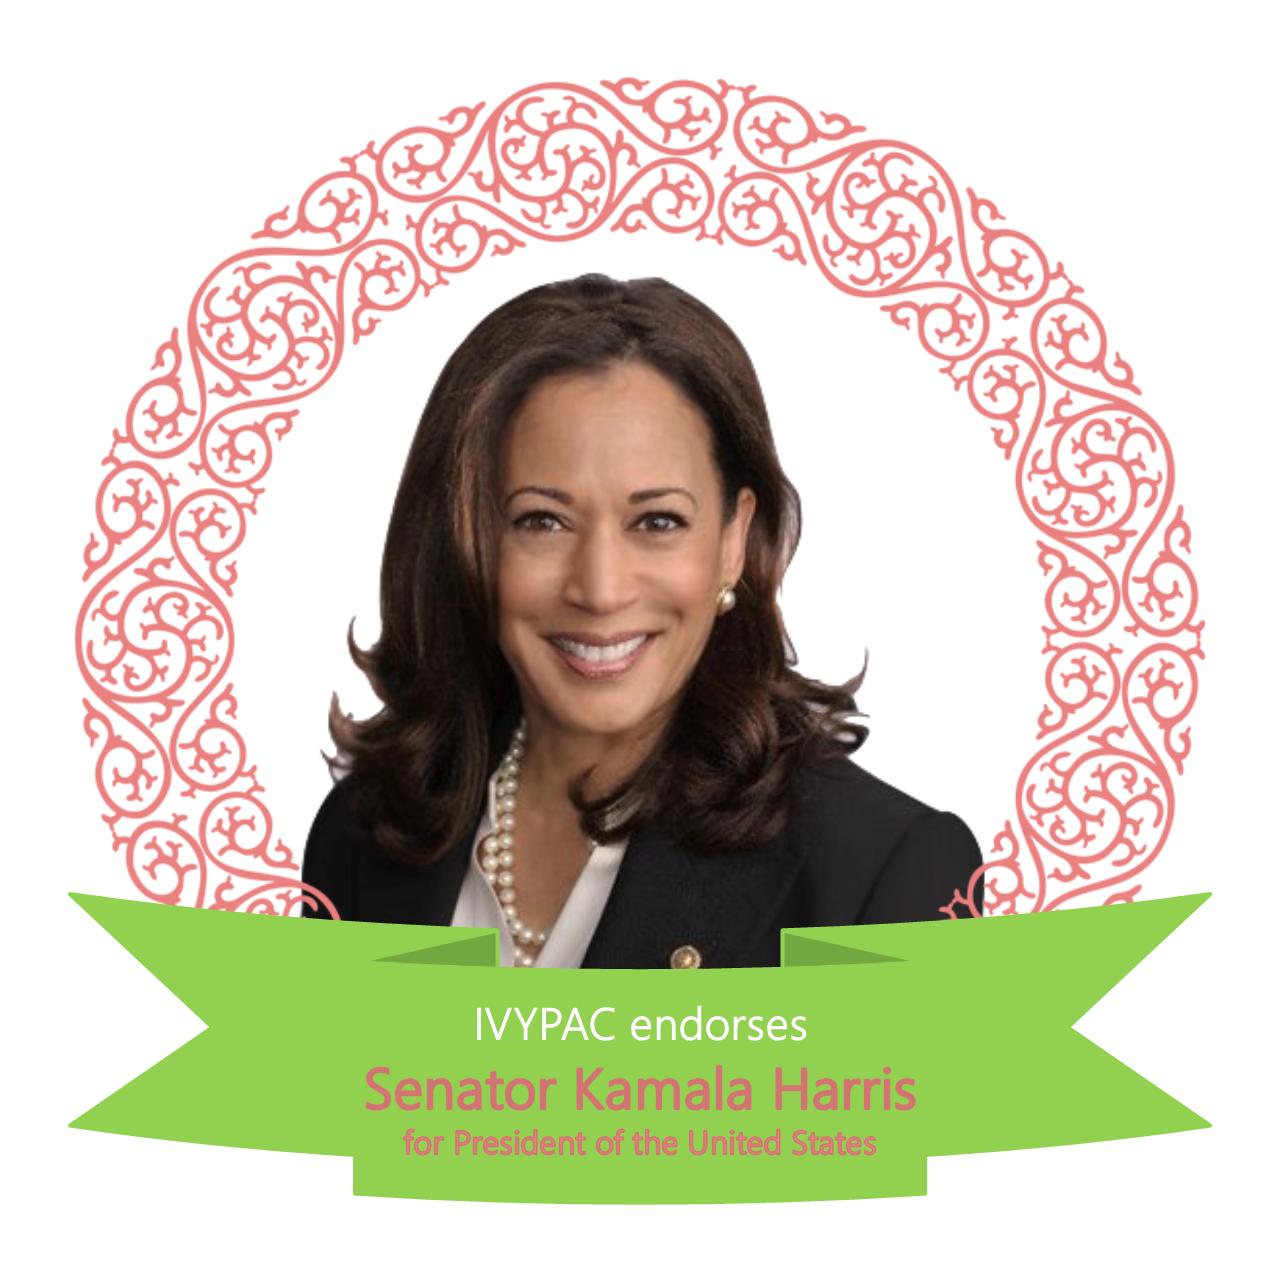 Ivypac Endorses First Candidate Of 2020 Election Cycle Senator Kamala Harris D Ca Ivypac